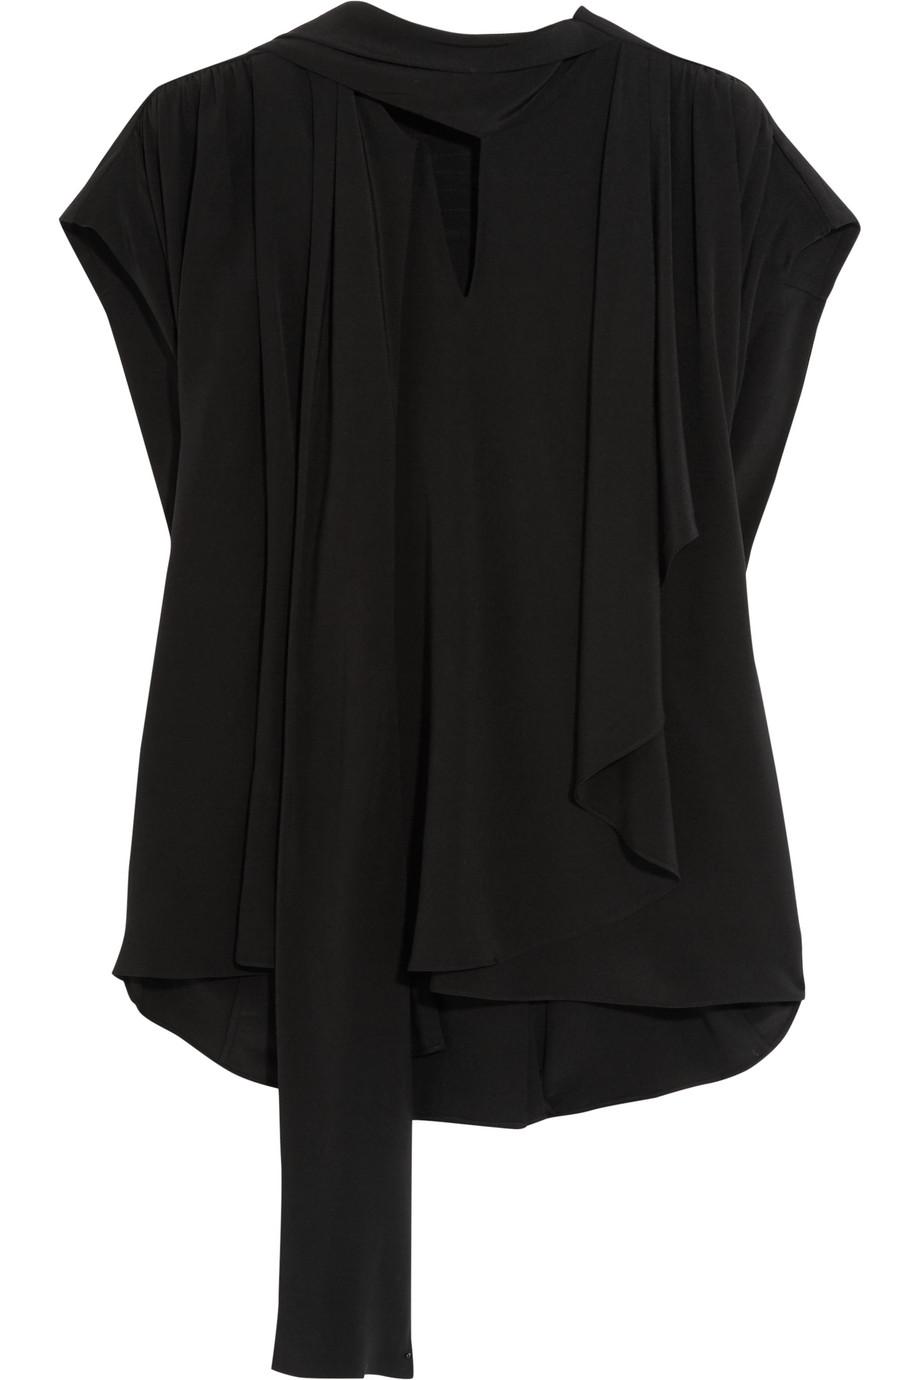 Balenciaga Draped Pussy-Bow Silk Crepe De Chine Top, Black, Women's, Size: 42